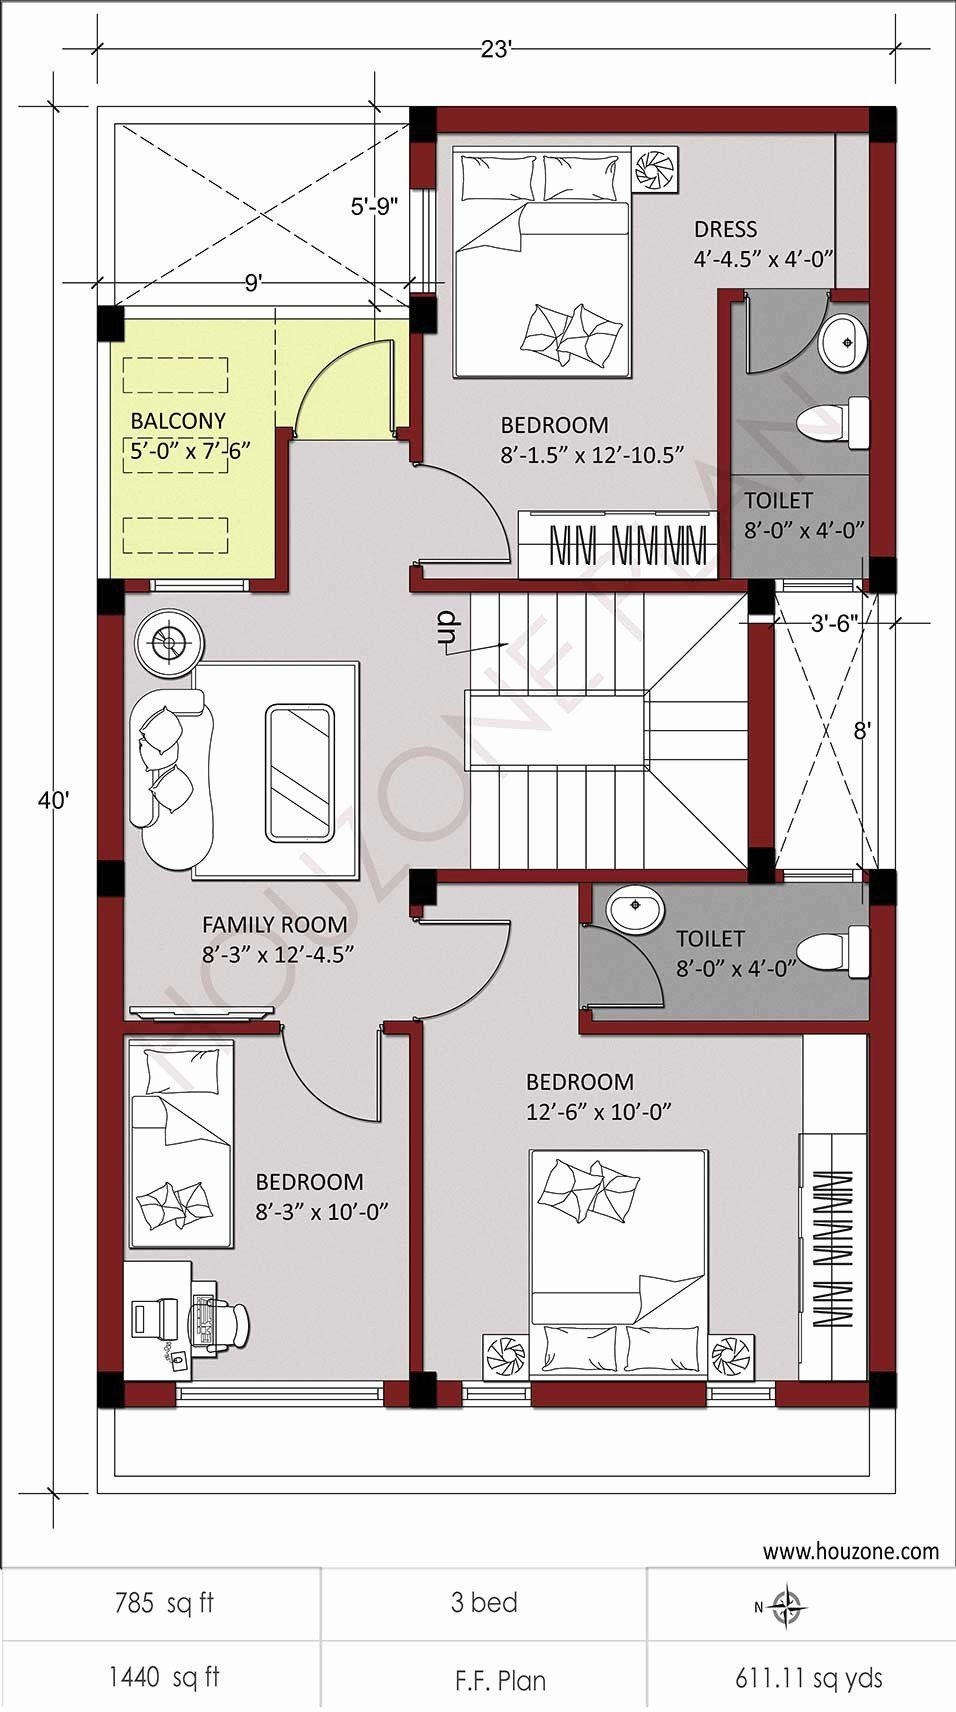 1440 Sq Ft House Plans Elegant 57 Fresh Simple House Layout Image Daftar Harga Pilihan Simple Farmhouse Plans Home Design Floor Plans Floor Plan Design